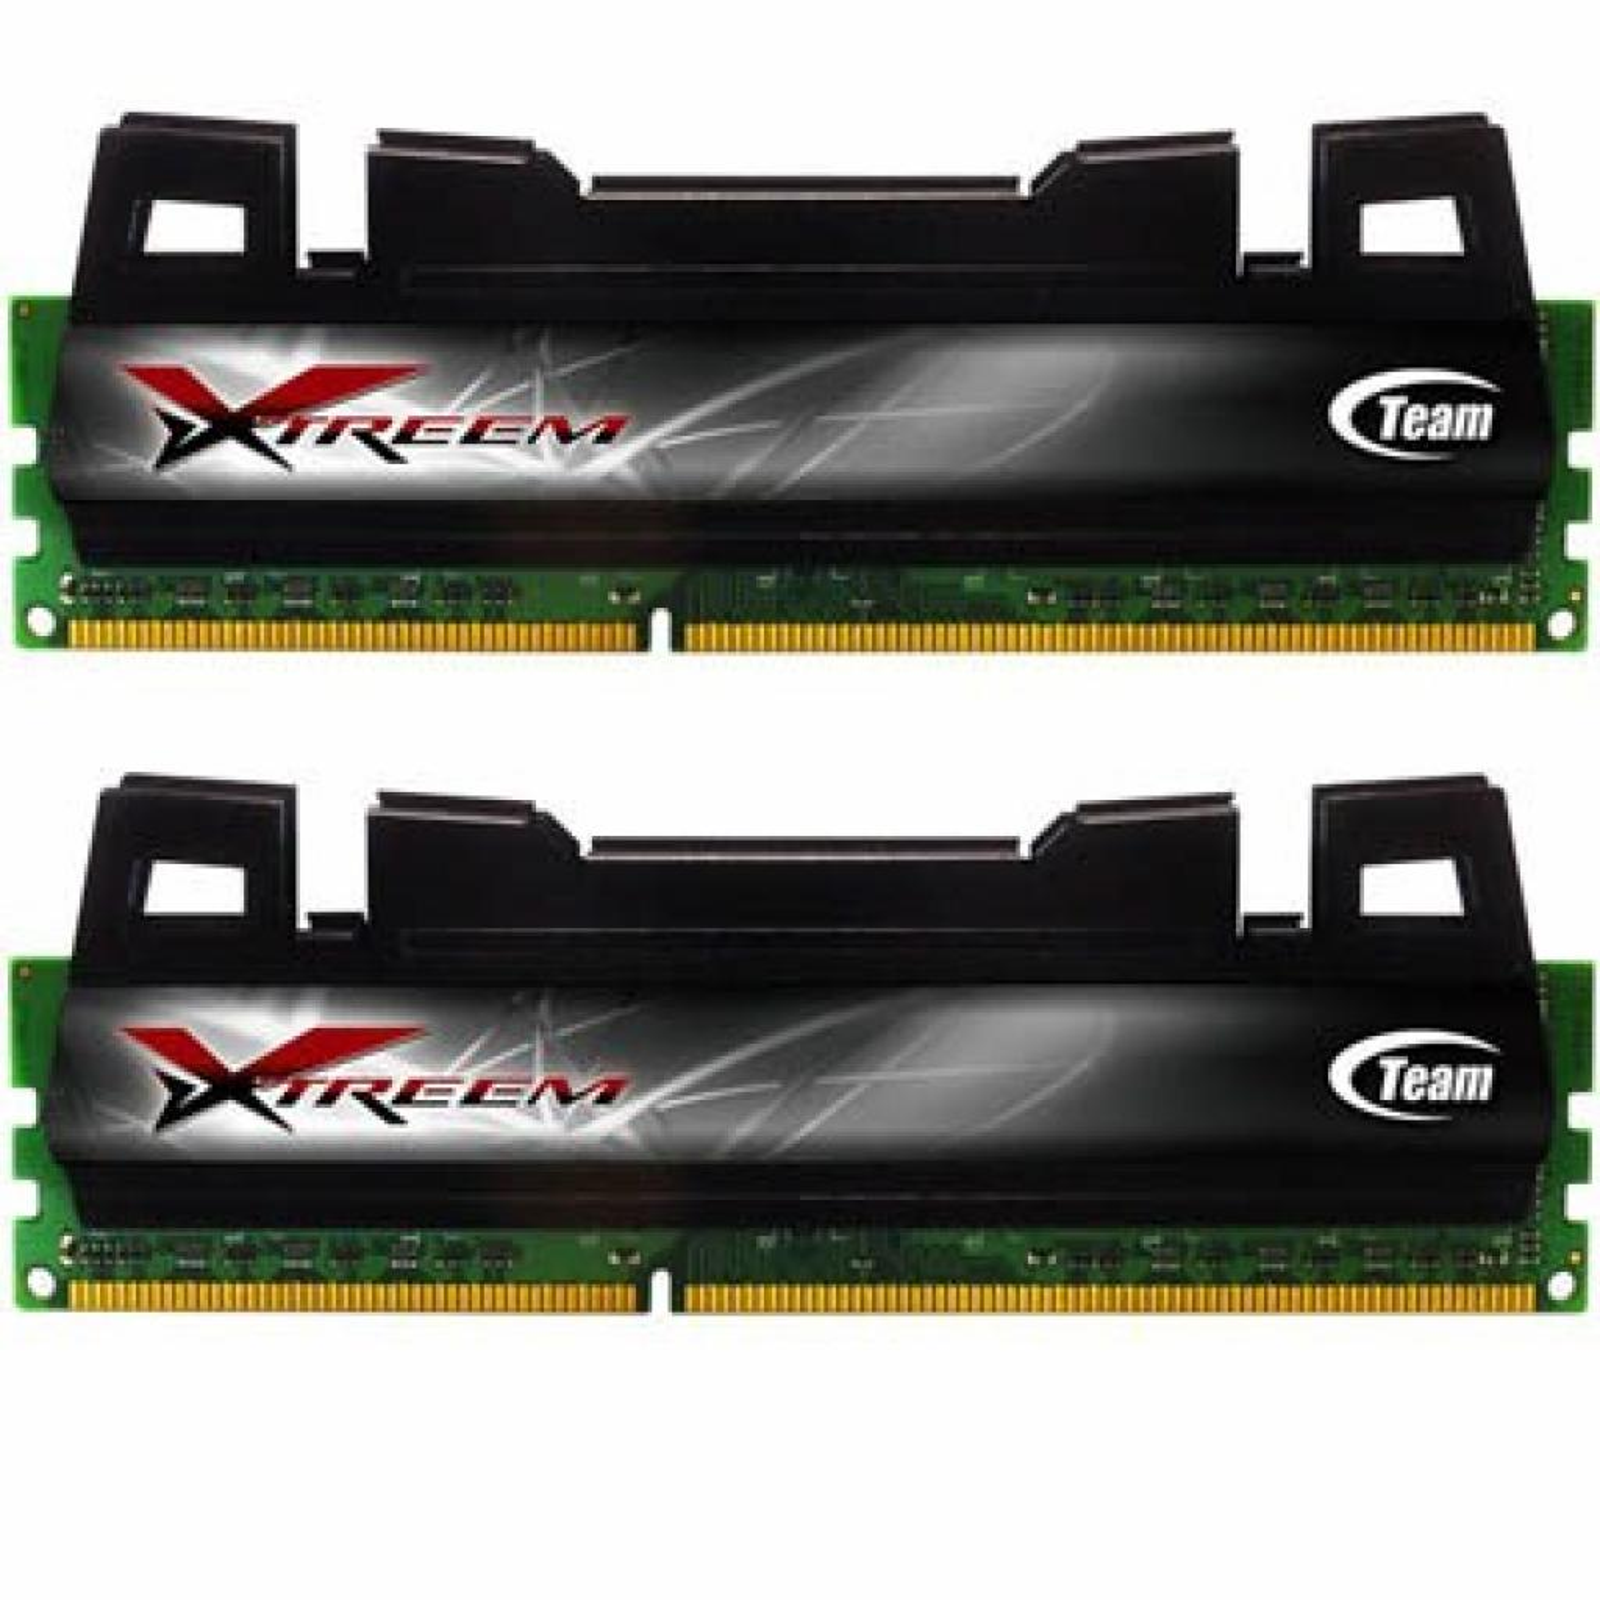 Модуль памяти для компьютера DDR3 8GB (2x4GB) 1866 MHz Team (TXD38192M1866HC9KDC-D)